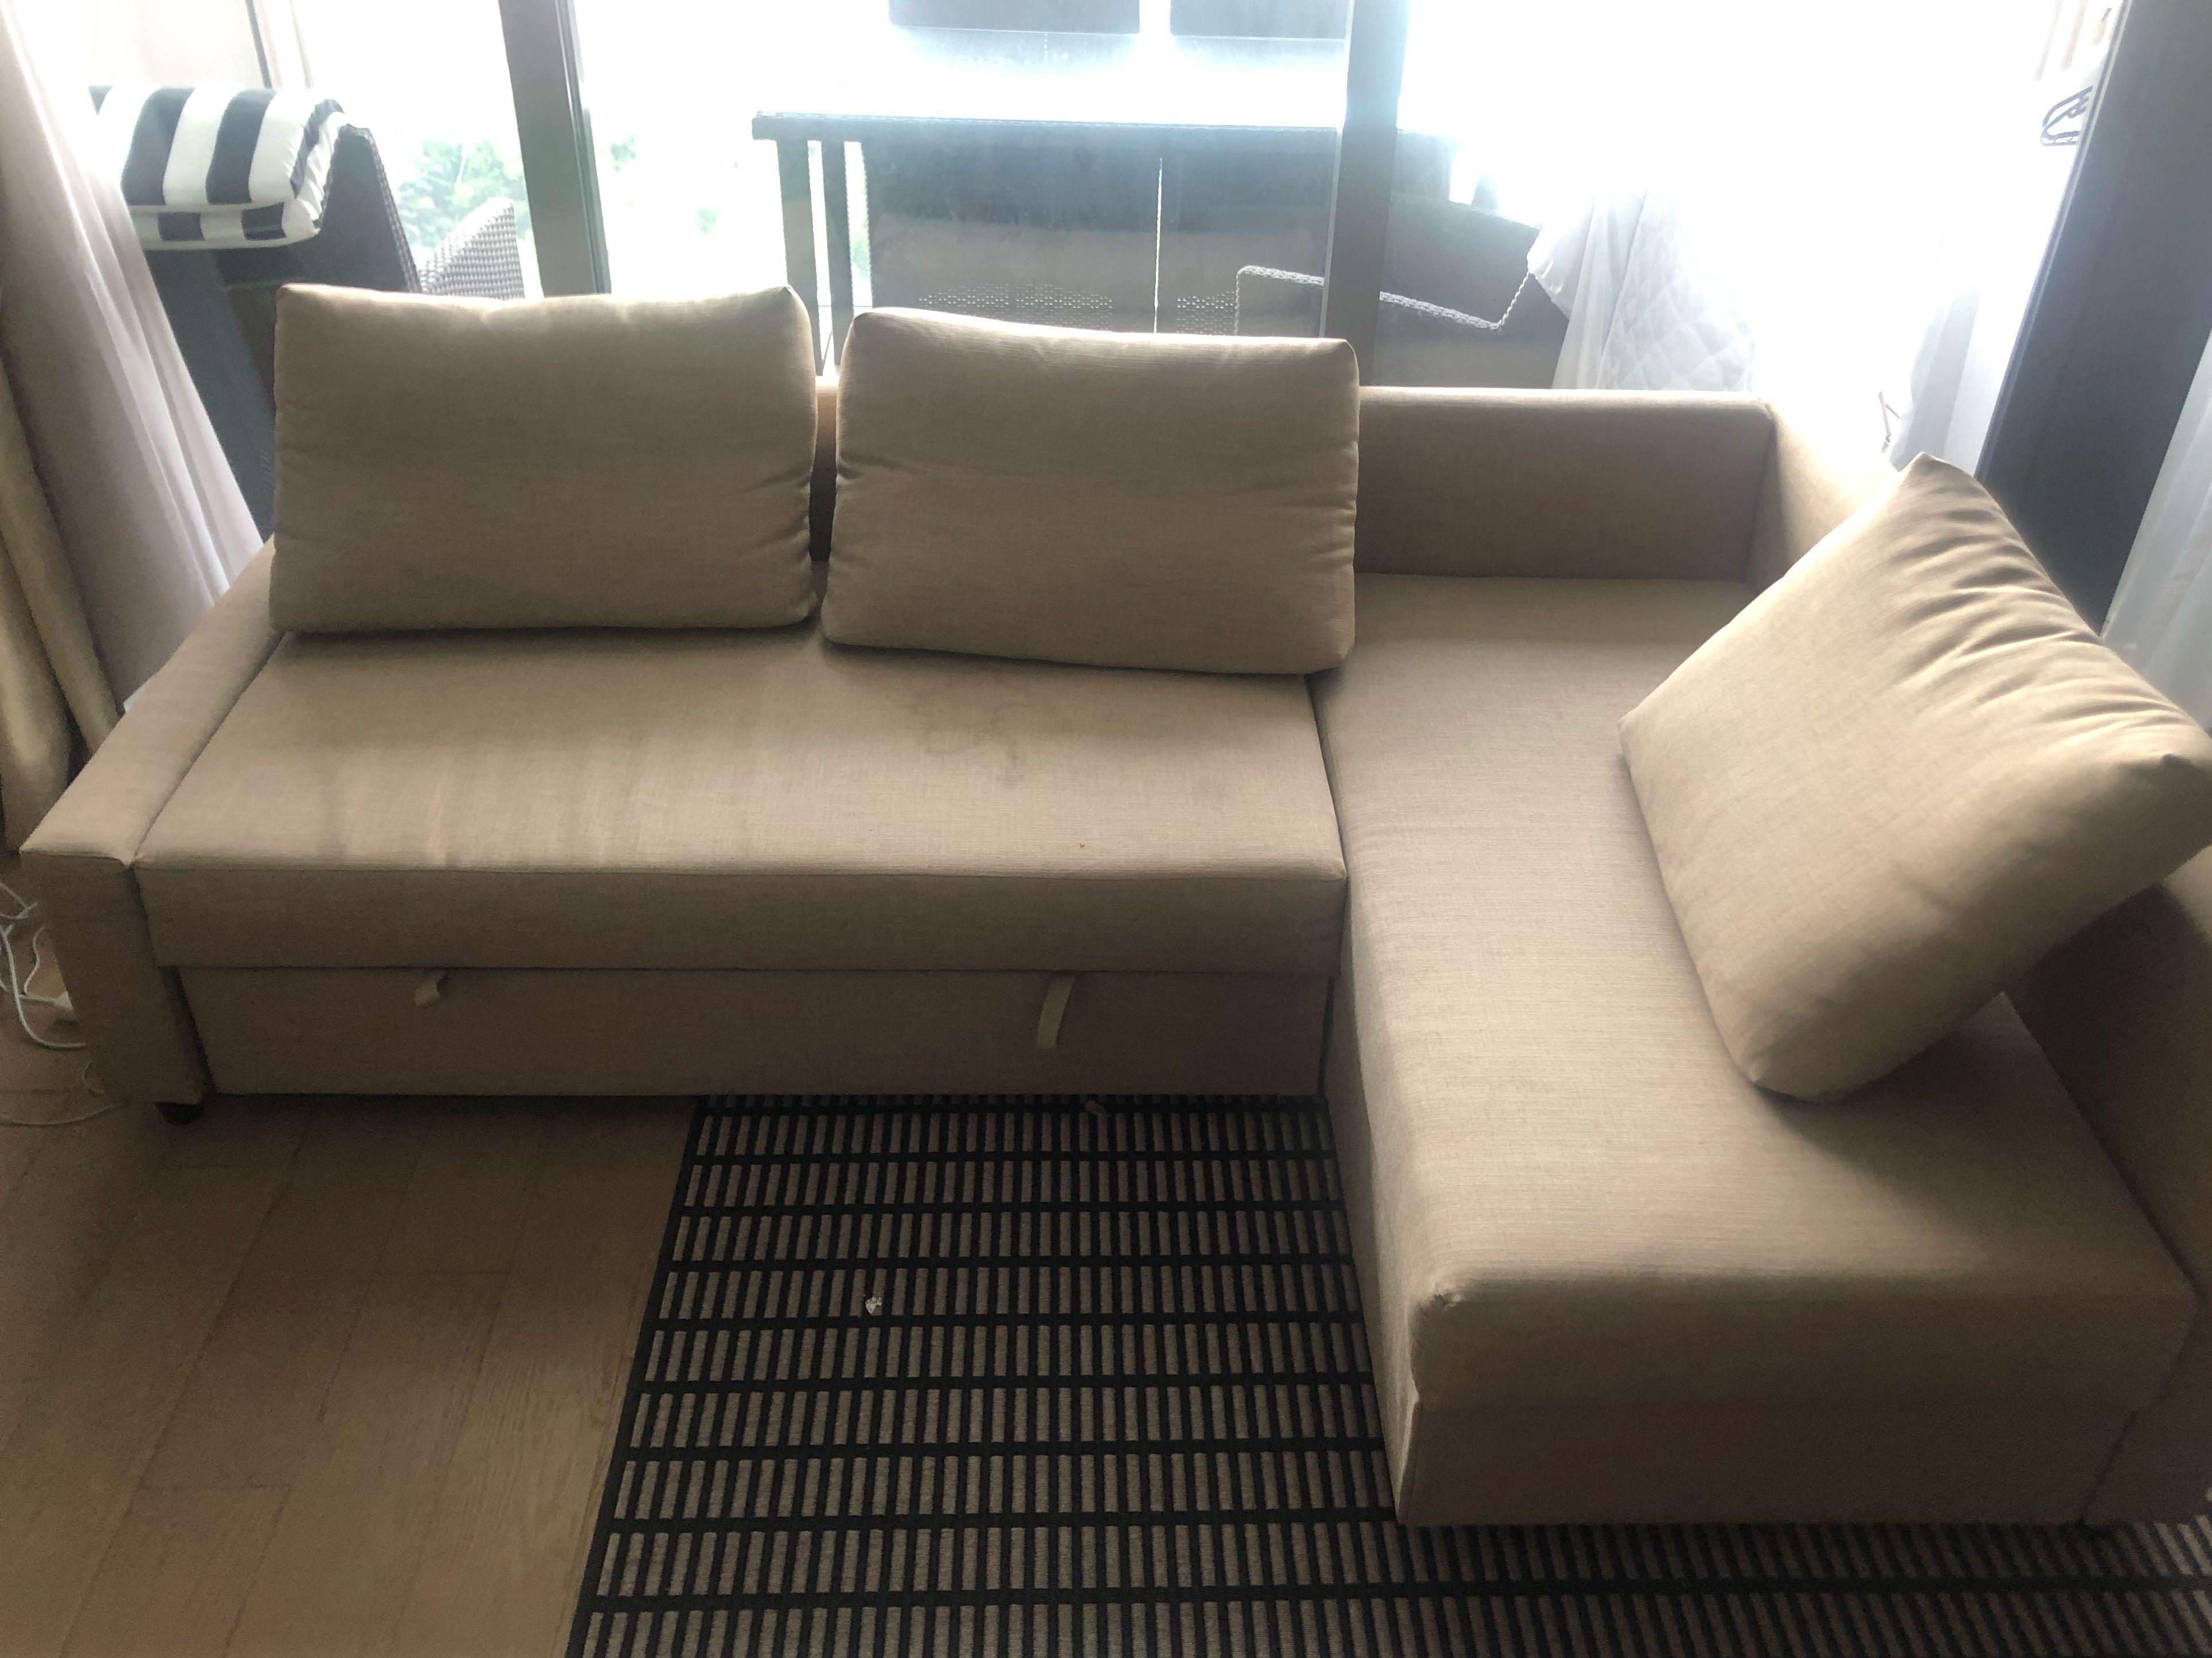 Ikea L Shaped Couch.L Shaped Sofa Ikea